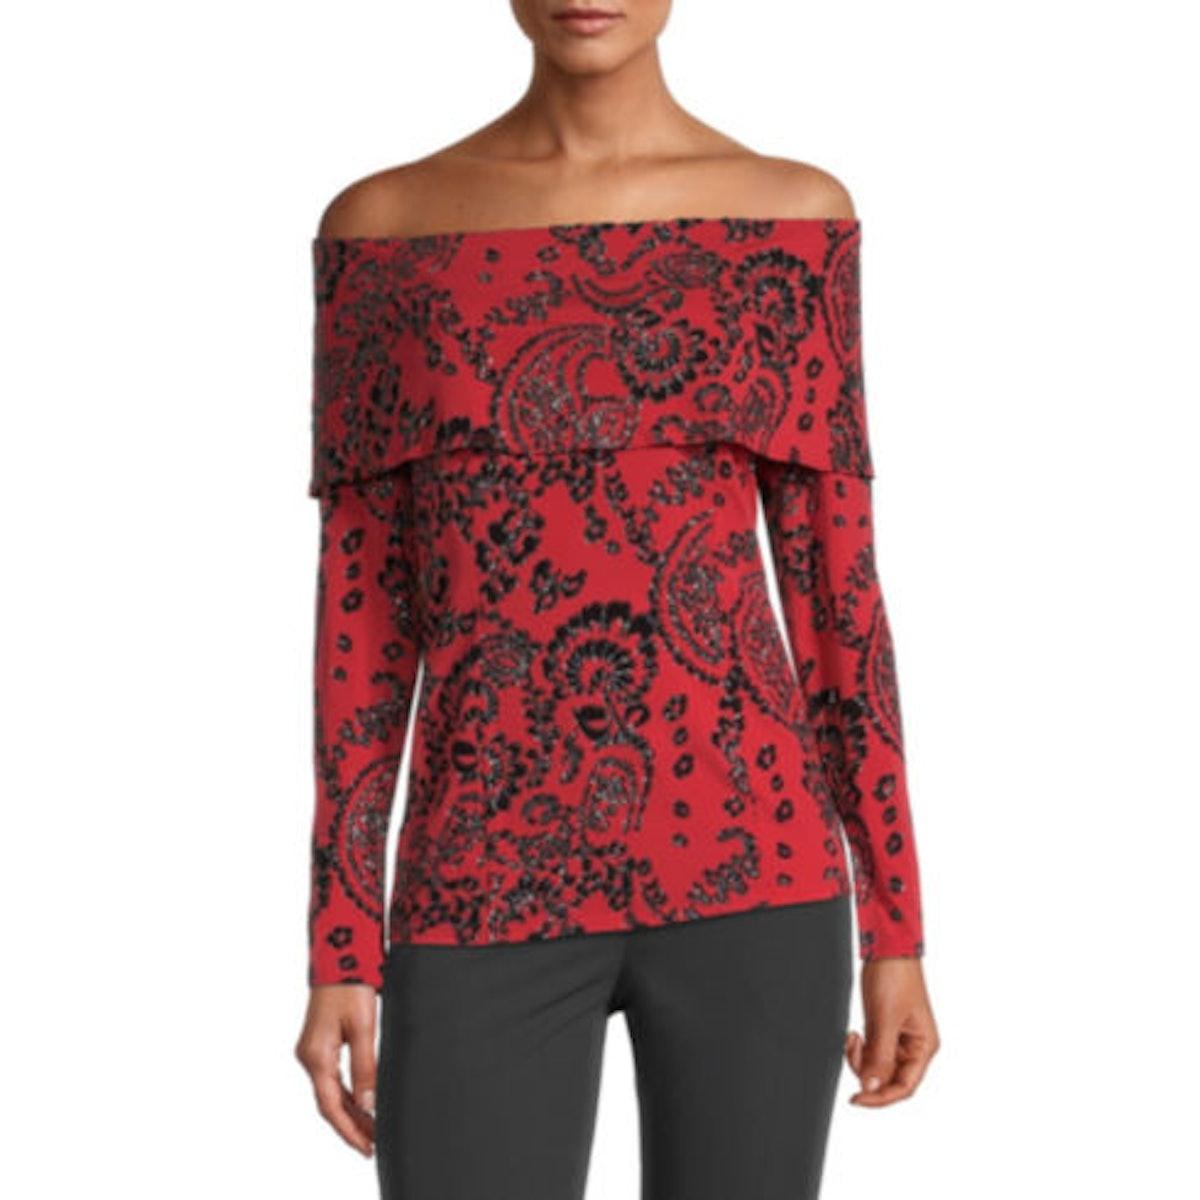 MSK Womens Straight Neck Long Sleeve Knit Blouse